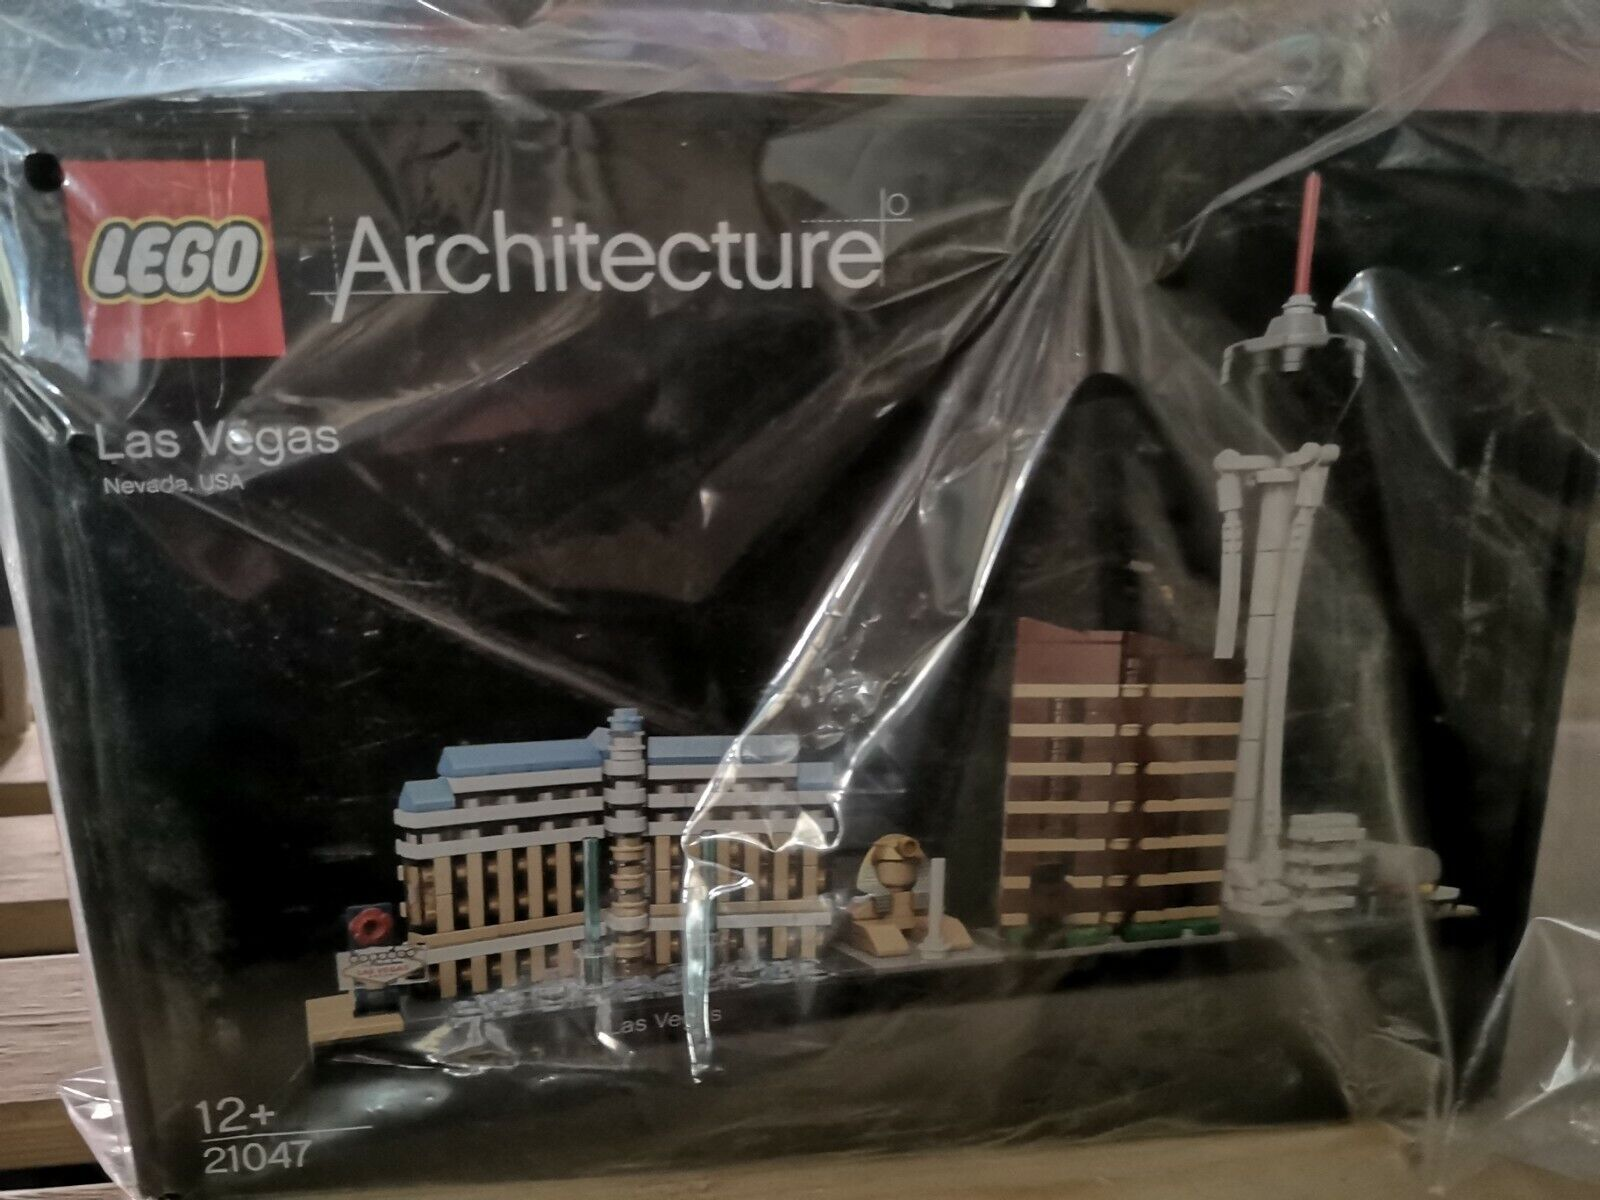 Lego Architecture 21047 Las Vegas Las Vegas Baukästen unvollständig SO